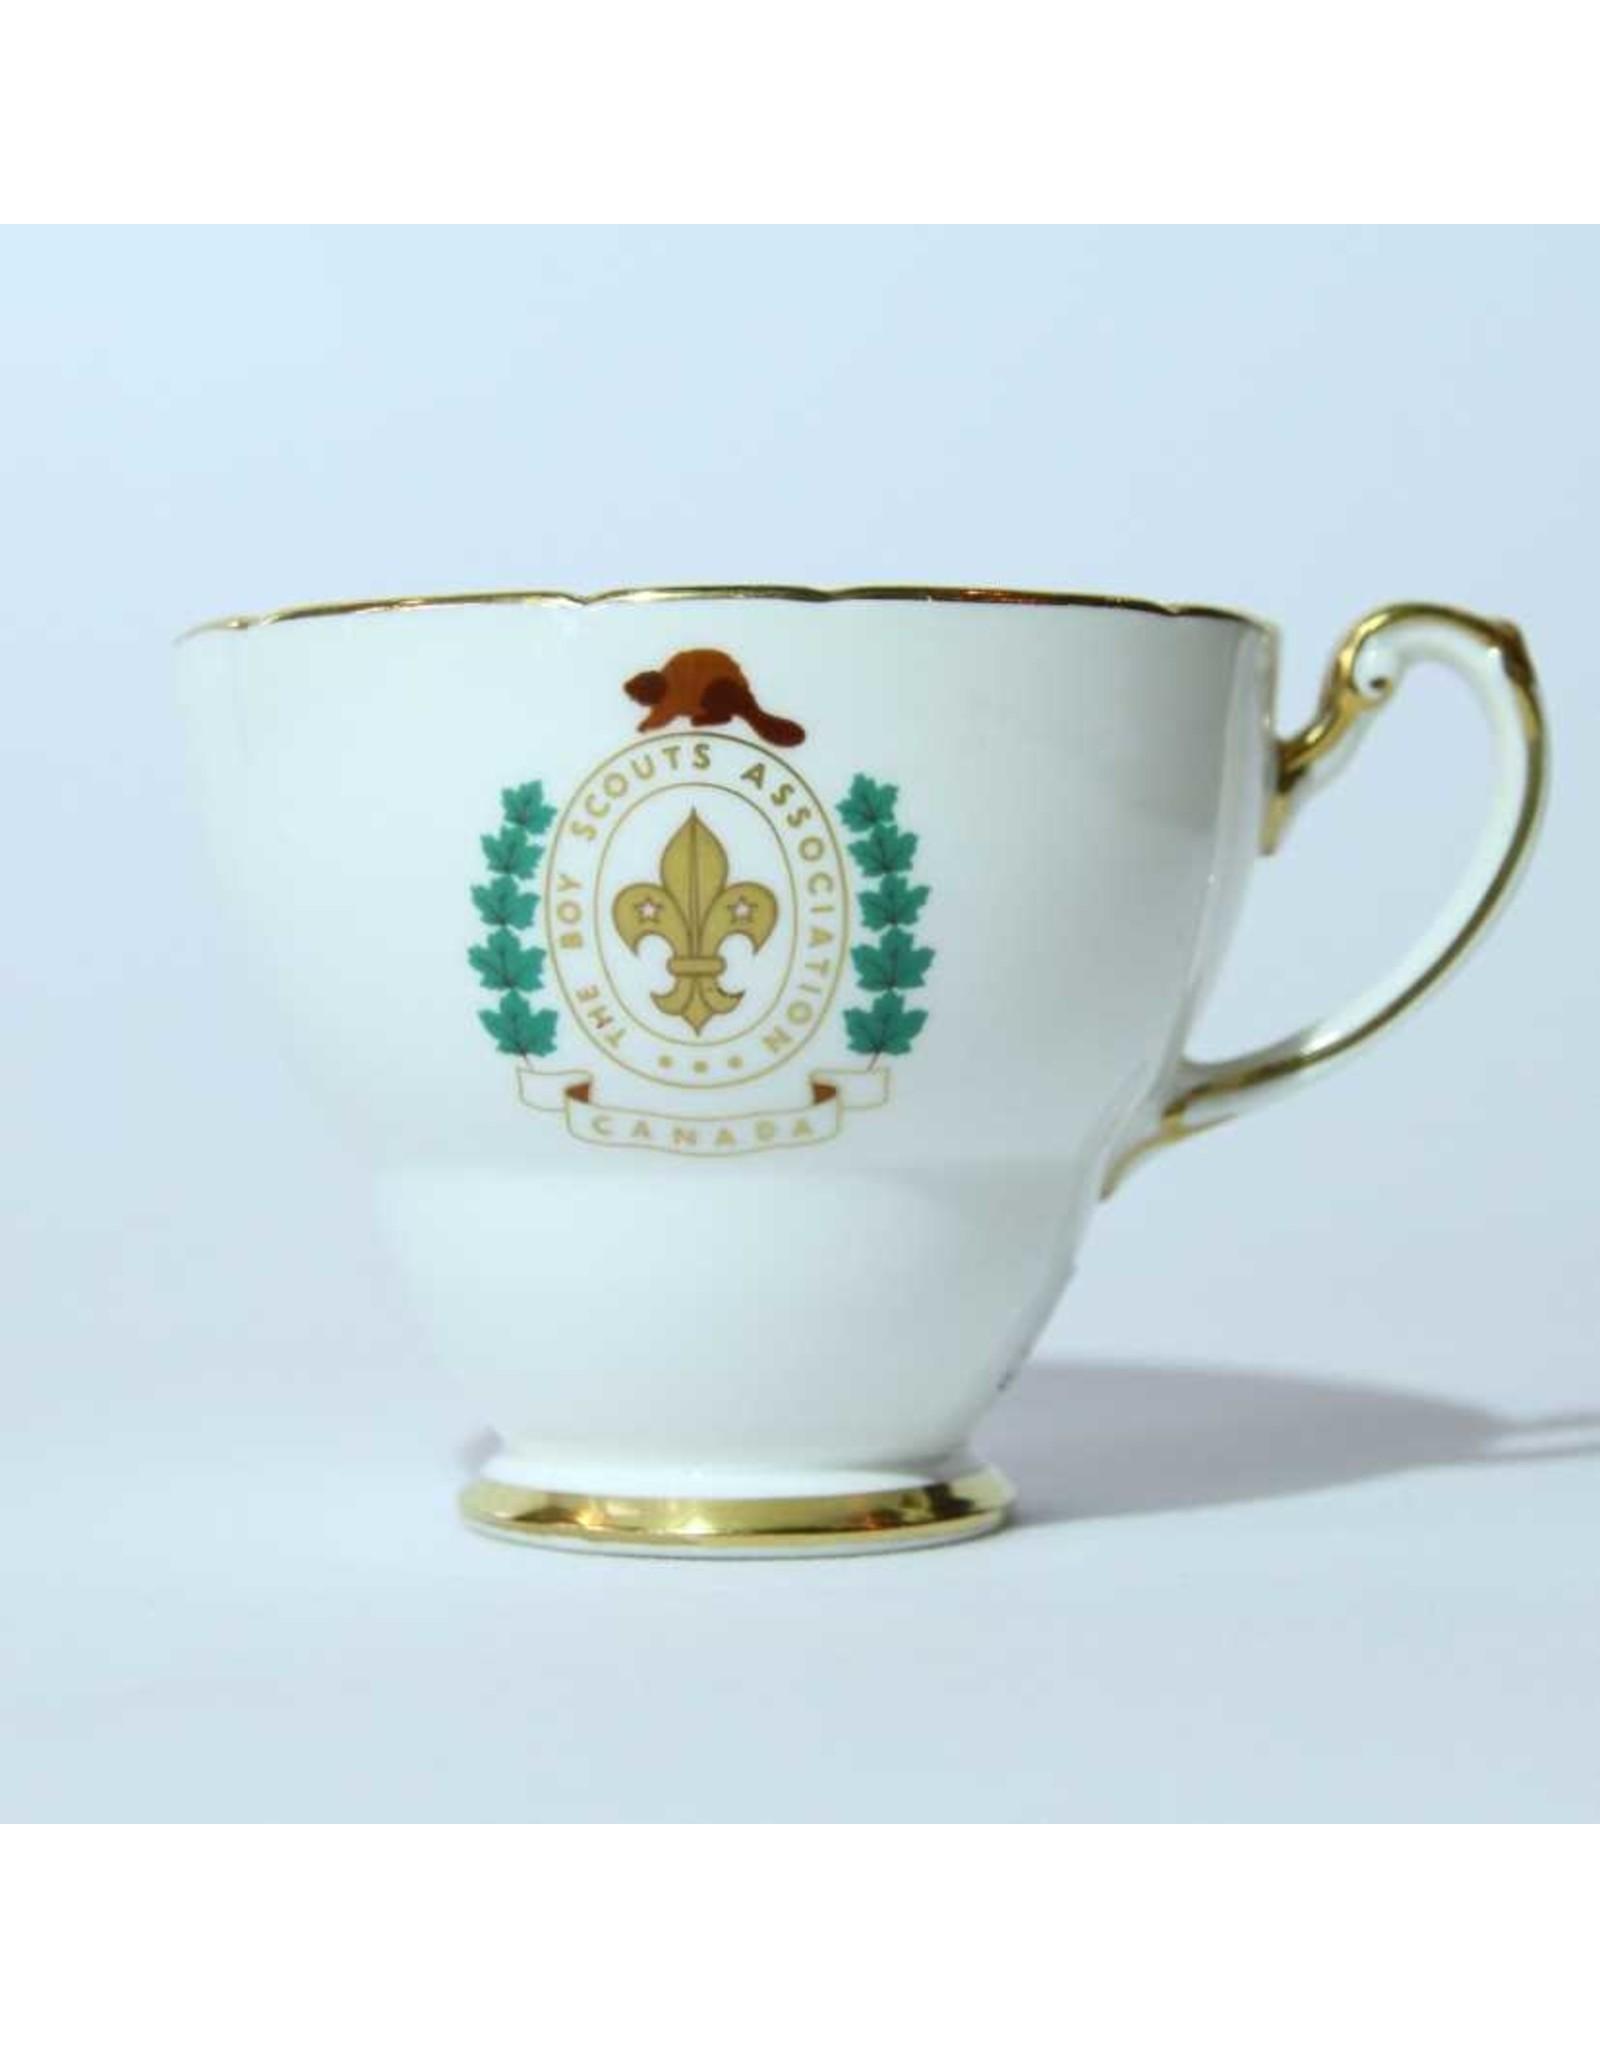 Boy Scouts Association of Canada - tea cup